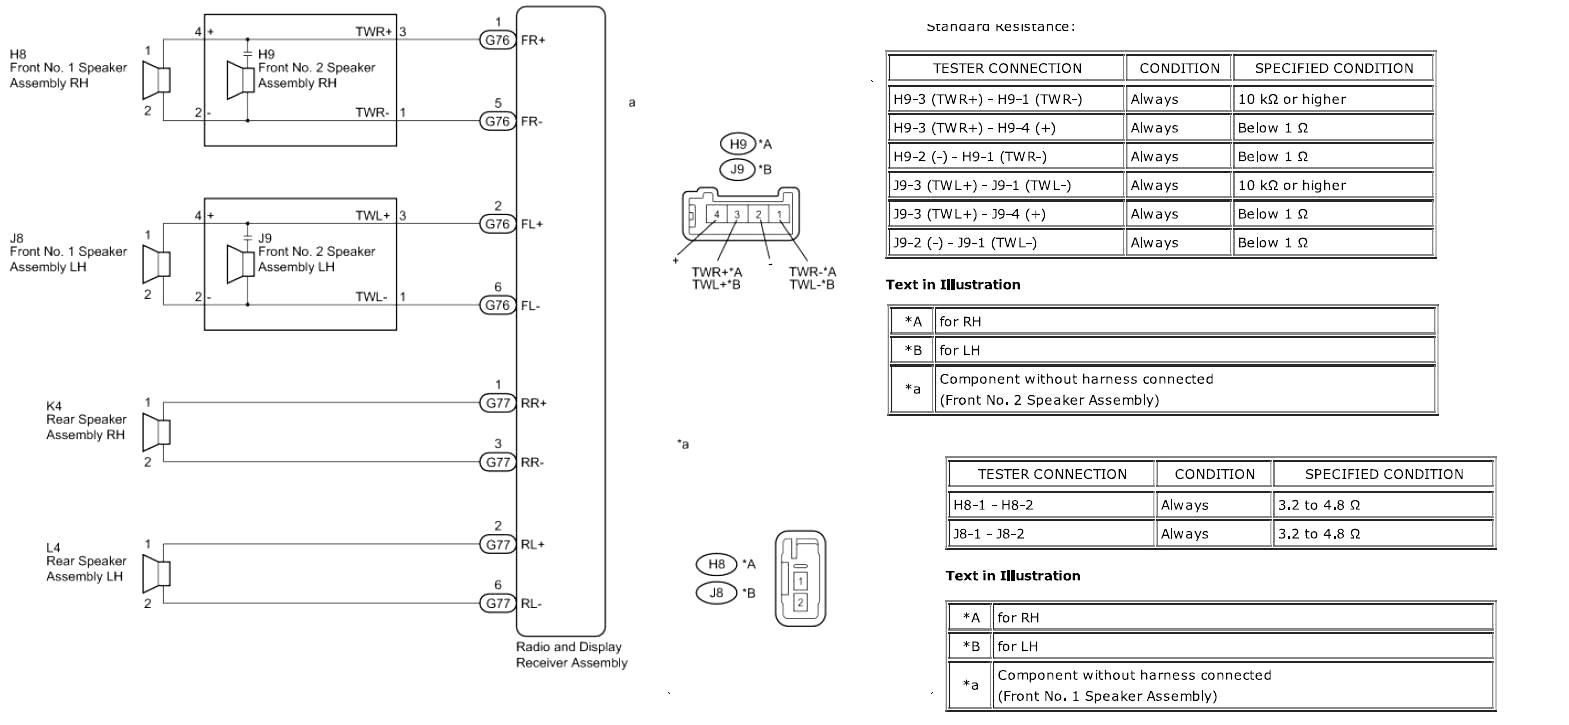 deh p6800mp wiring diagram wiring diagram expert mix pioneer deh p5800mp wiring diagram wiring diagram deh